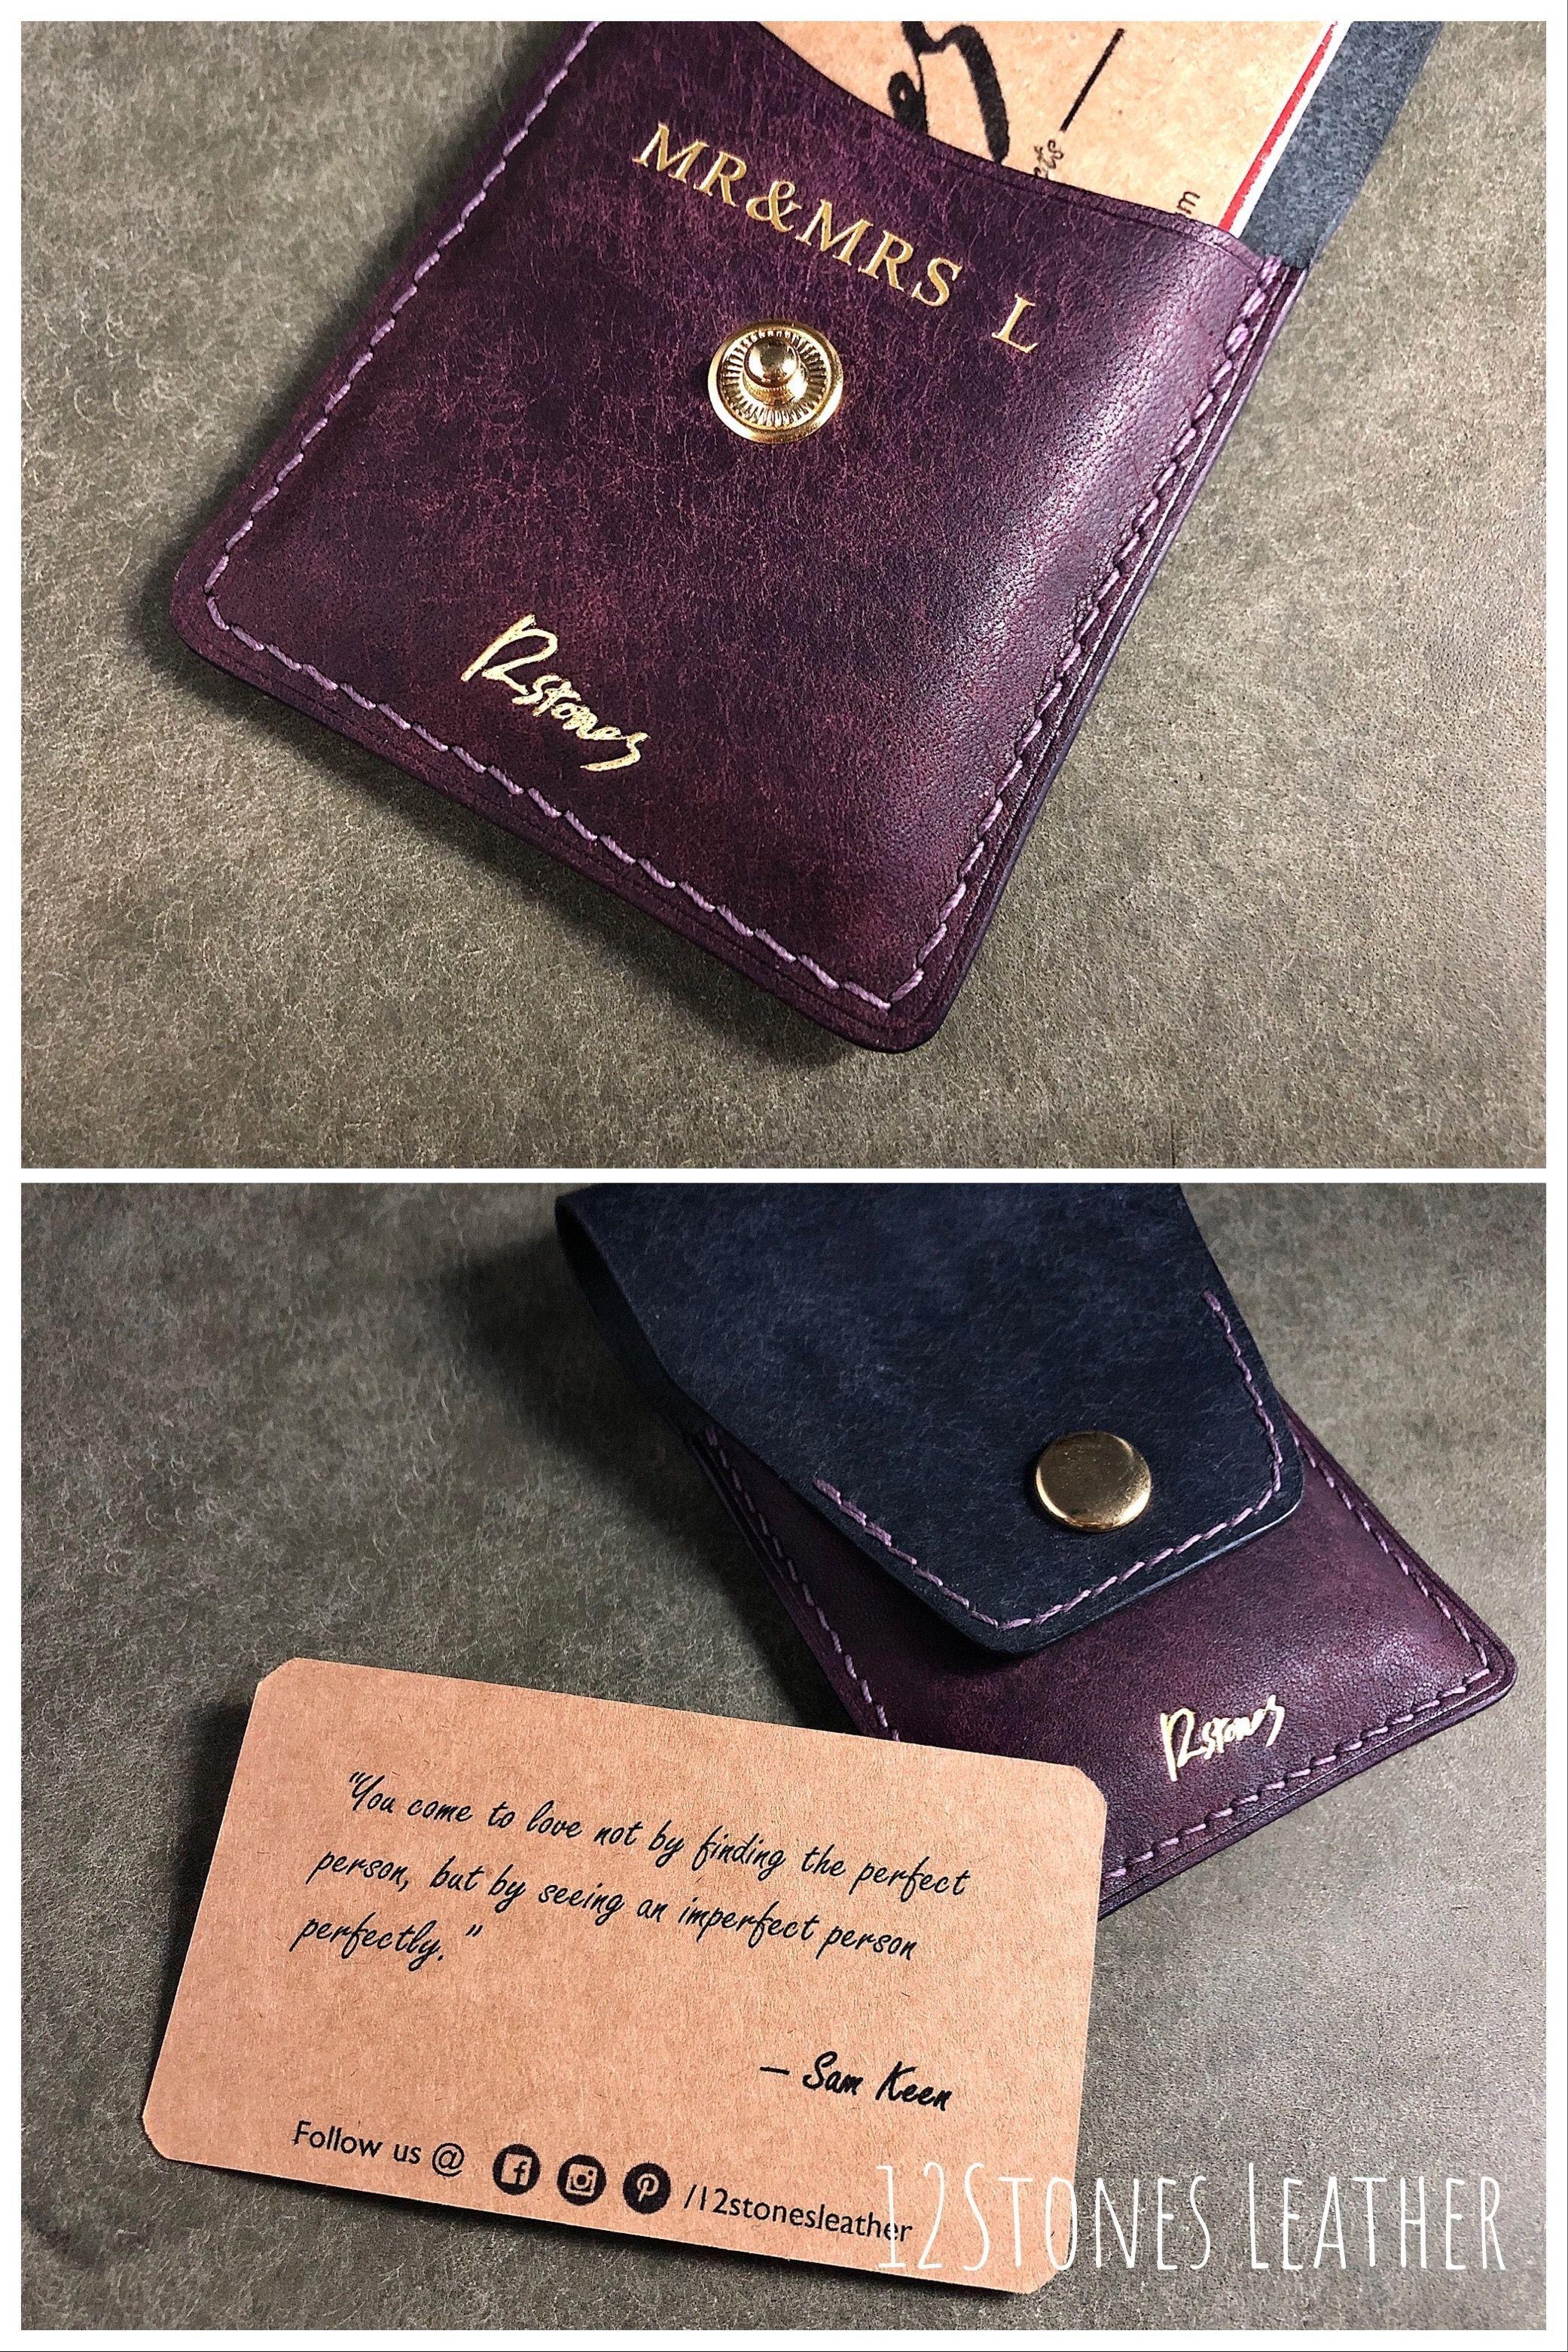 Female Card Holder Ladies Card Holder Custom Leather Card Holder Card Holder Leather Leather Business Card Holder Leather Business Cards